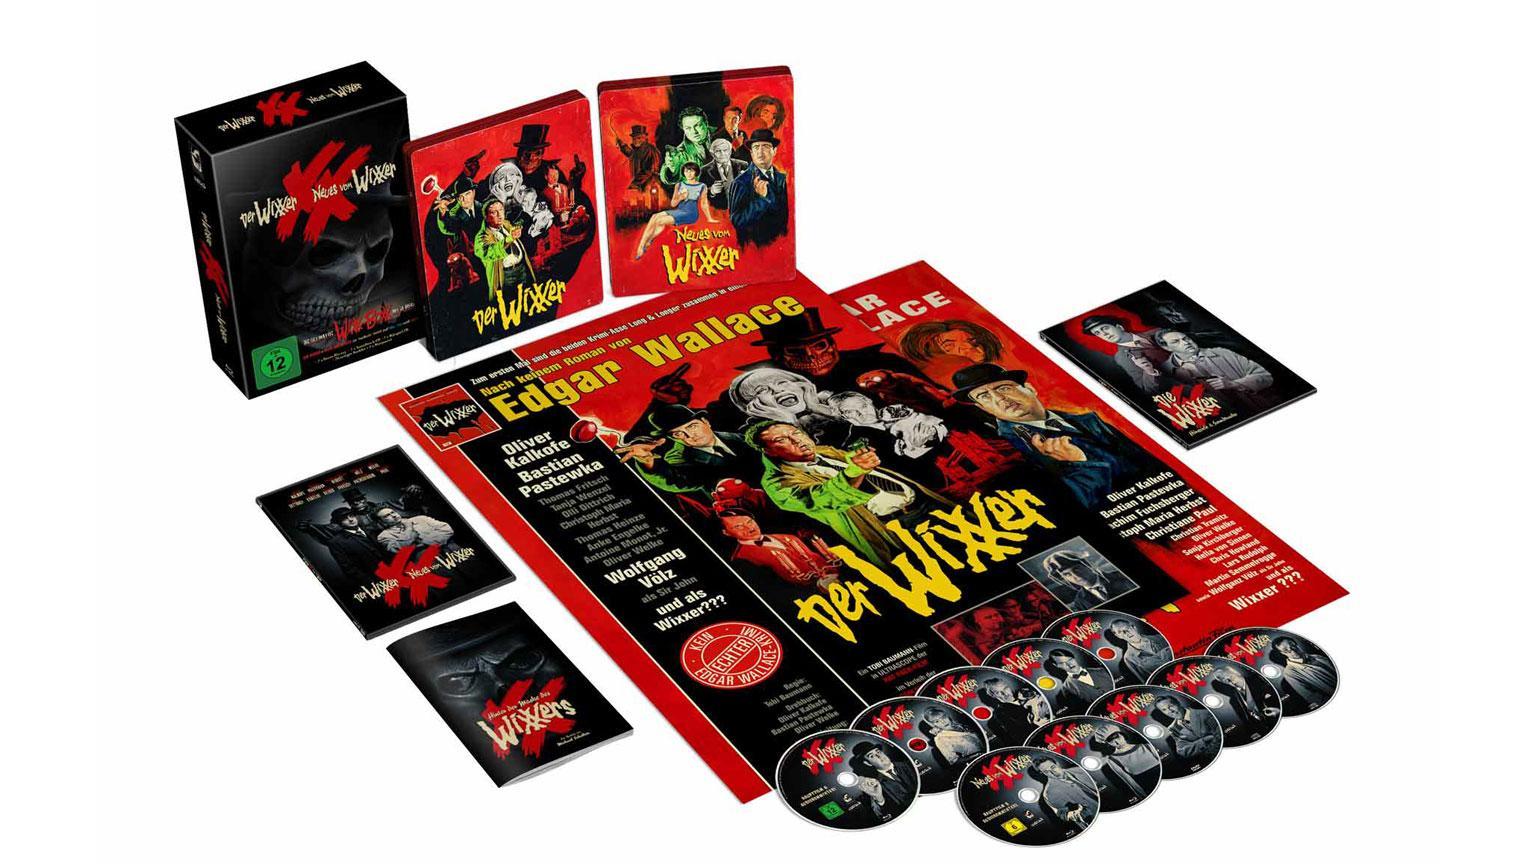 Die Ultimative WIXX-BOXX Film 2020 Special Edition Szenenbild Review shop kaufen